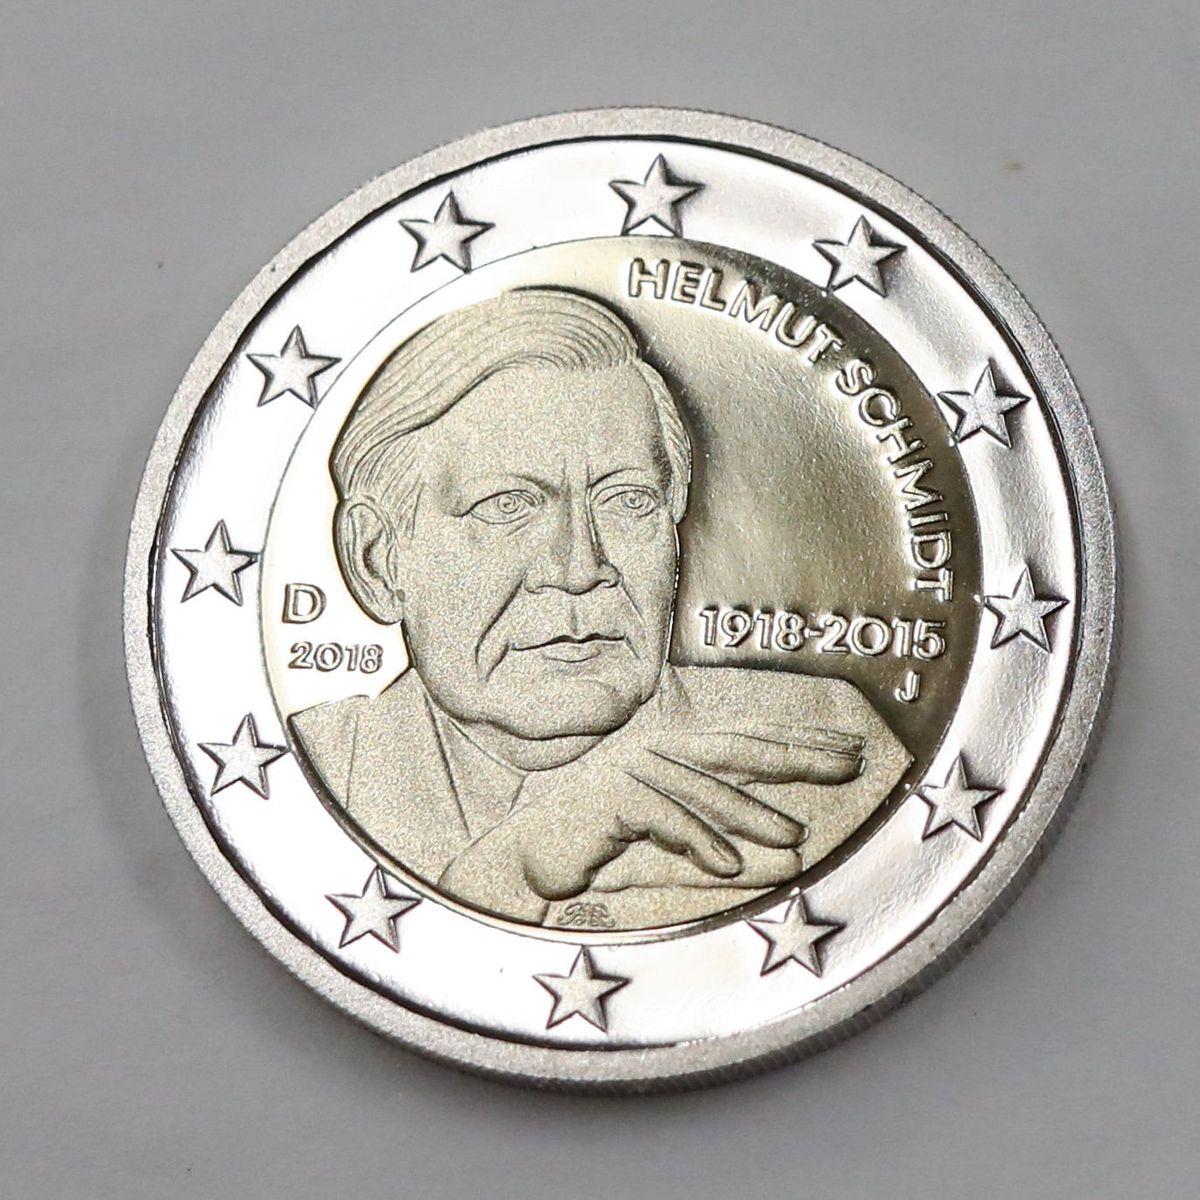 Neue 2 euro münze 2020